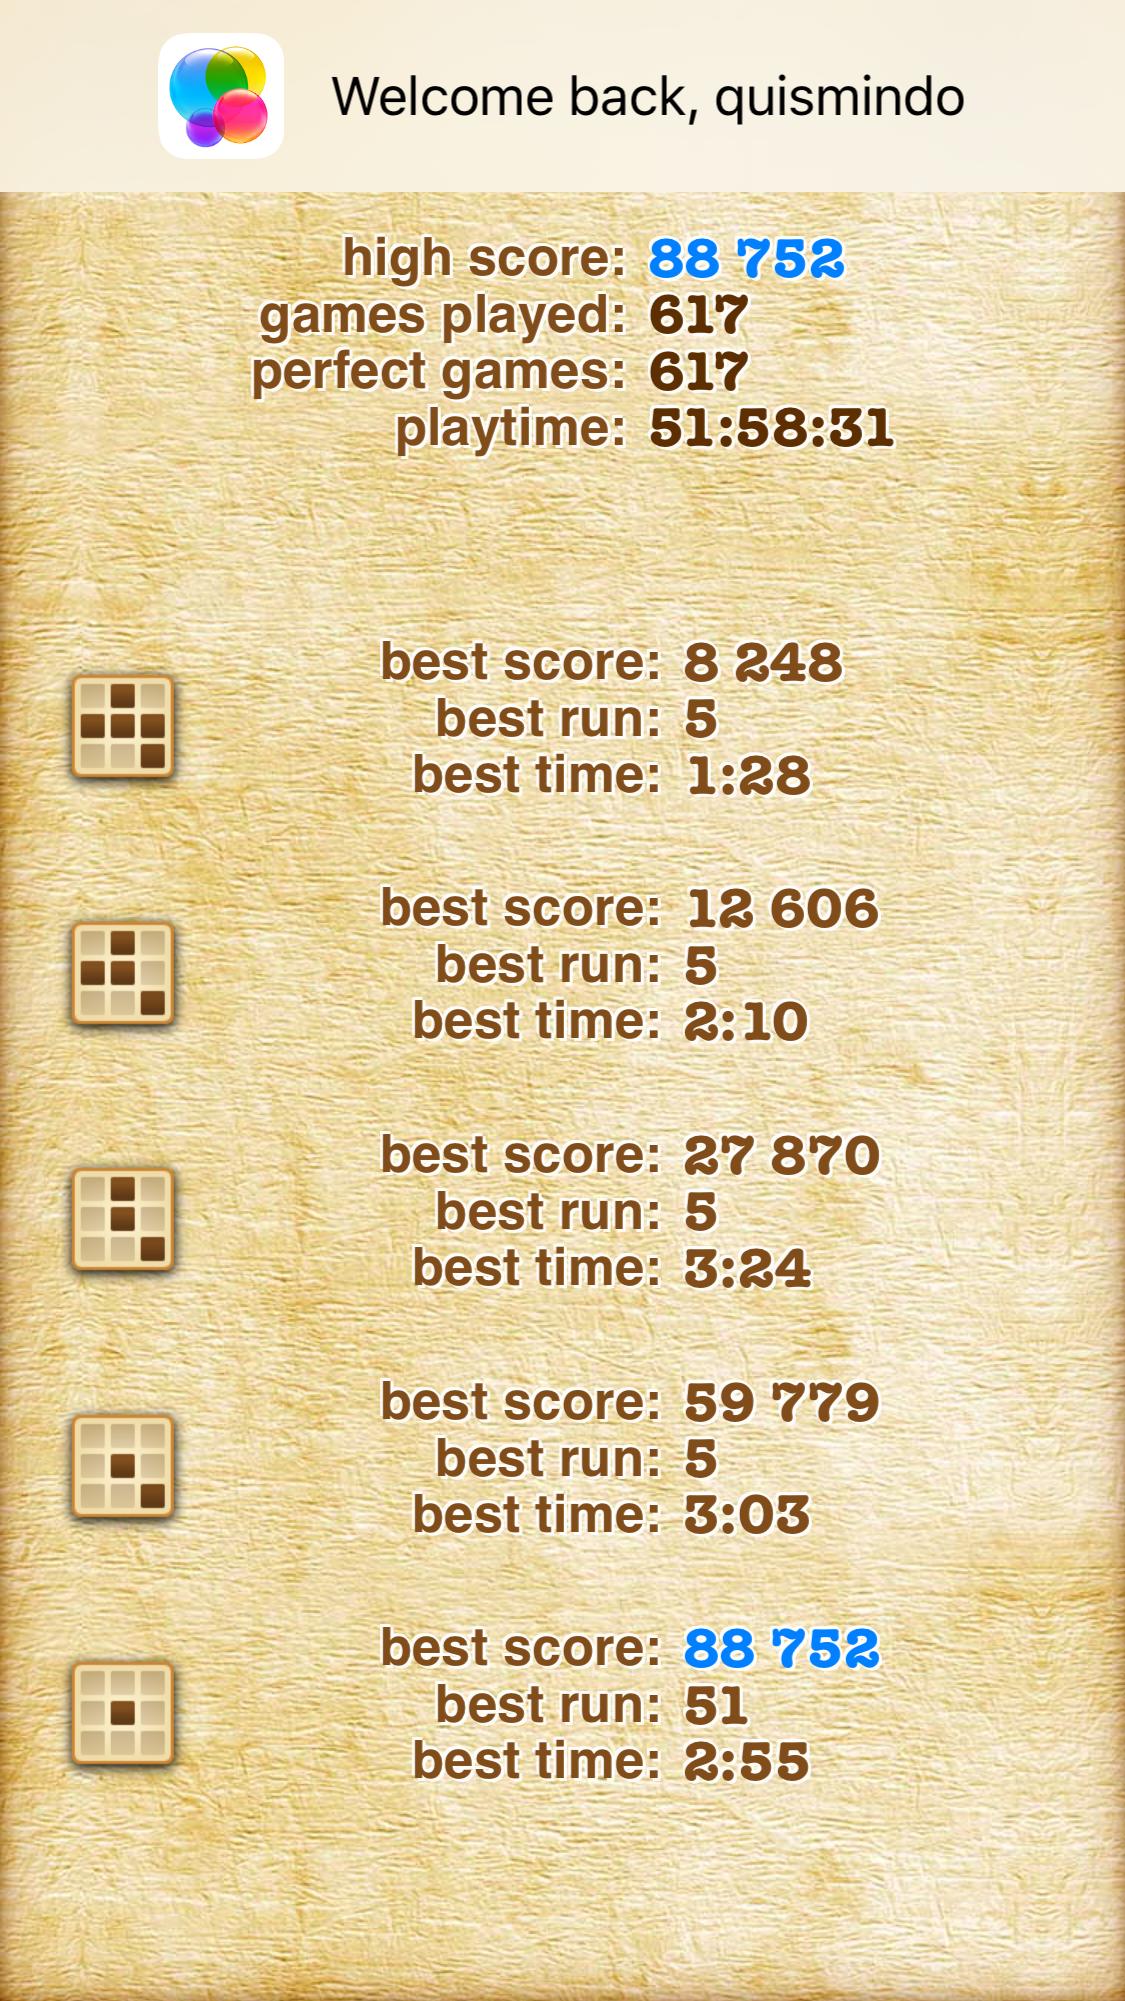 Maxwel: Sudoku 2 Pro [Easy] (iOS) 12,606 points on 2016-01-31 11:27:08